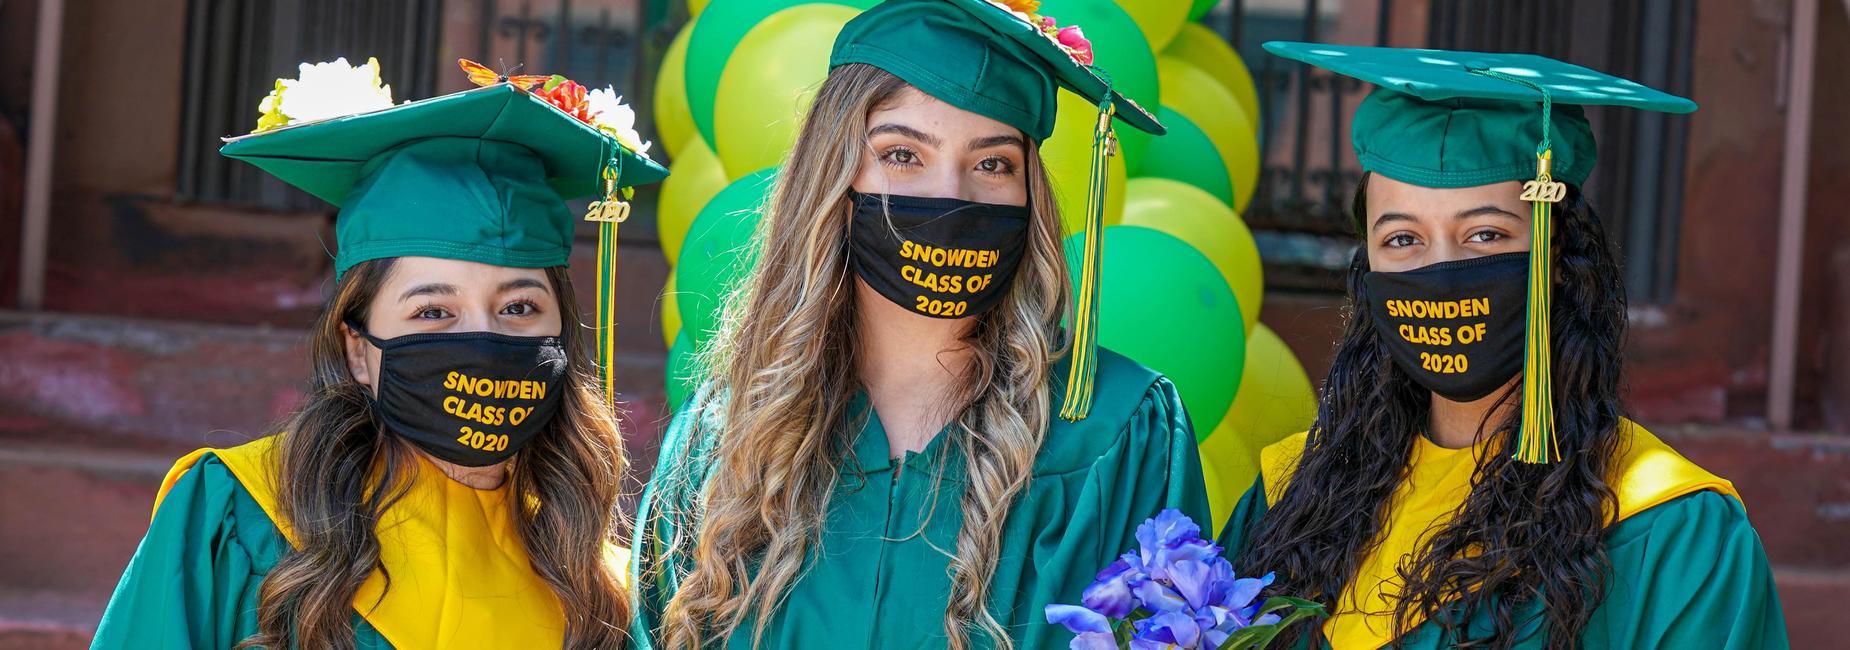 Snowden Graduates 2020